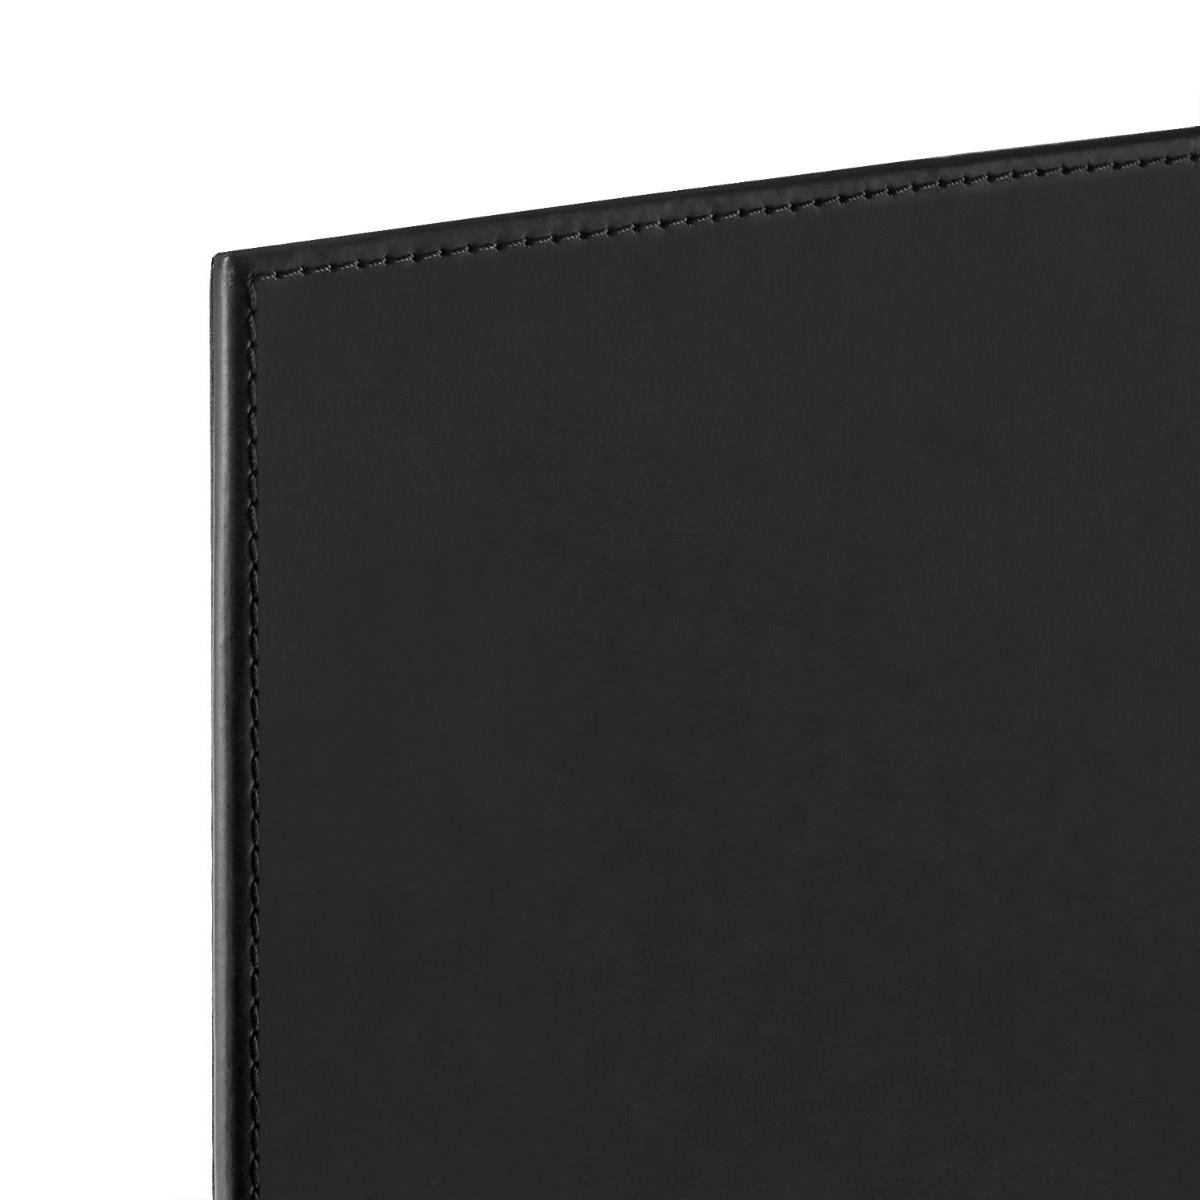 Spano Leather Desk Blotter | Black